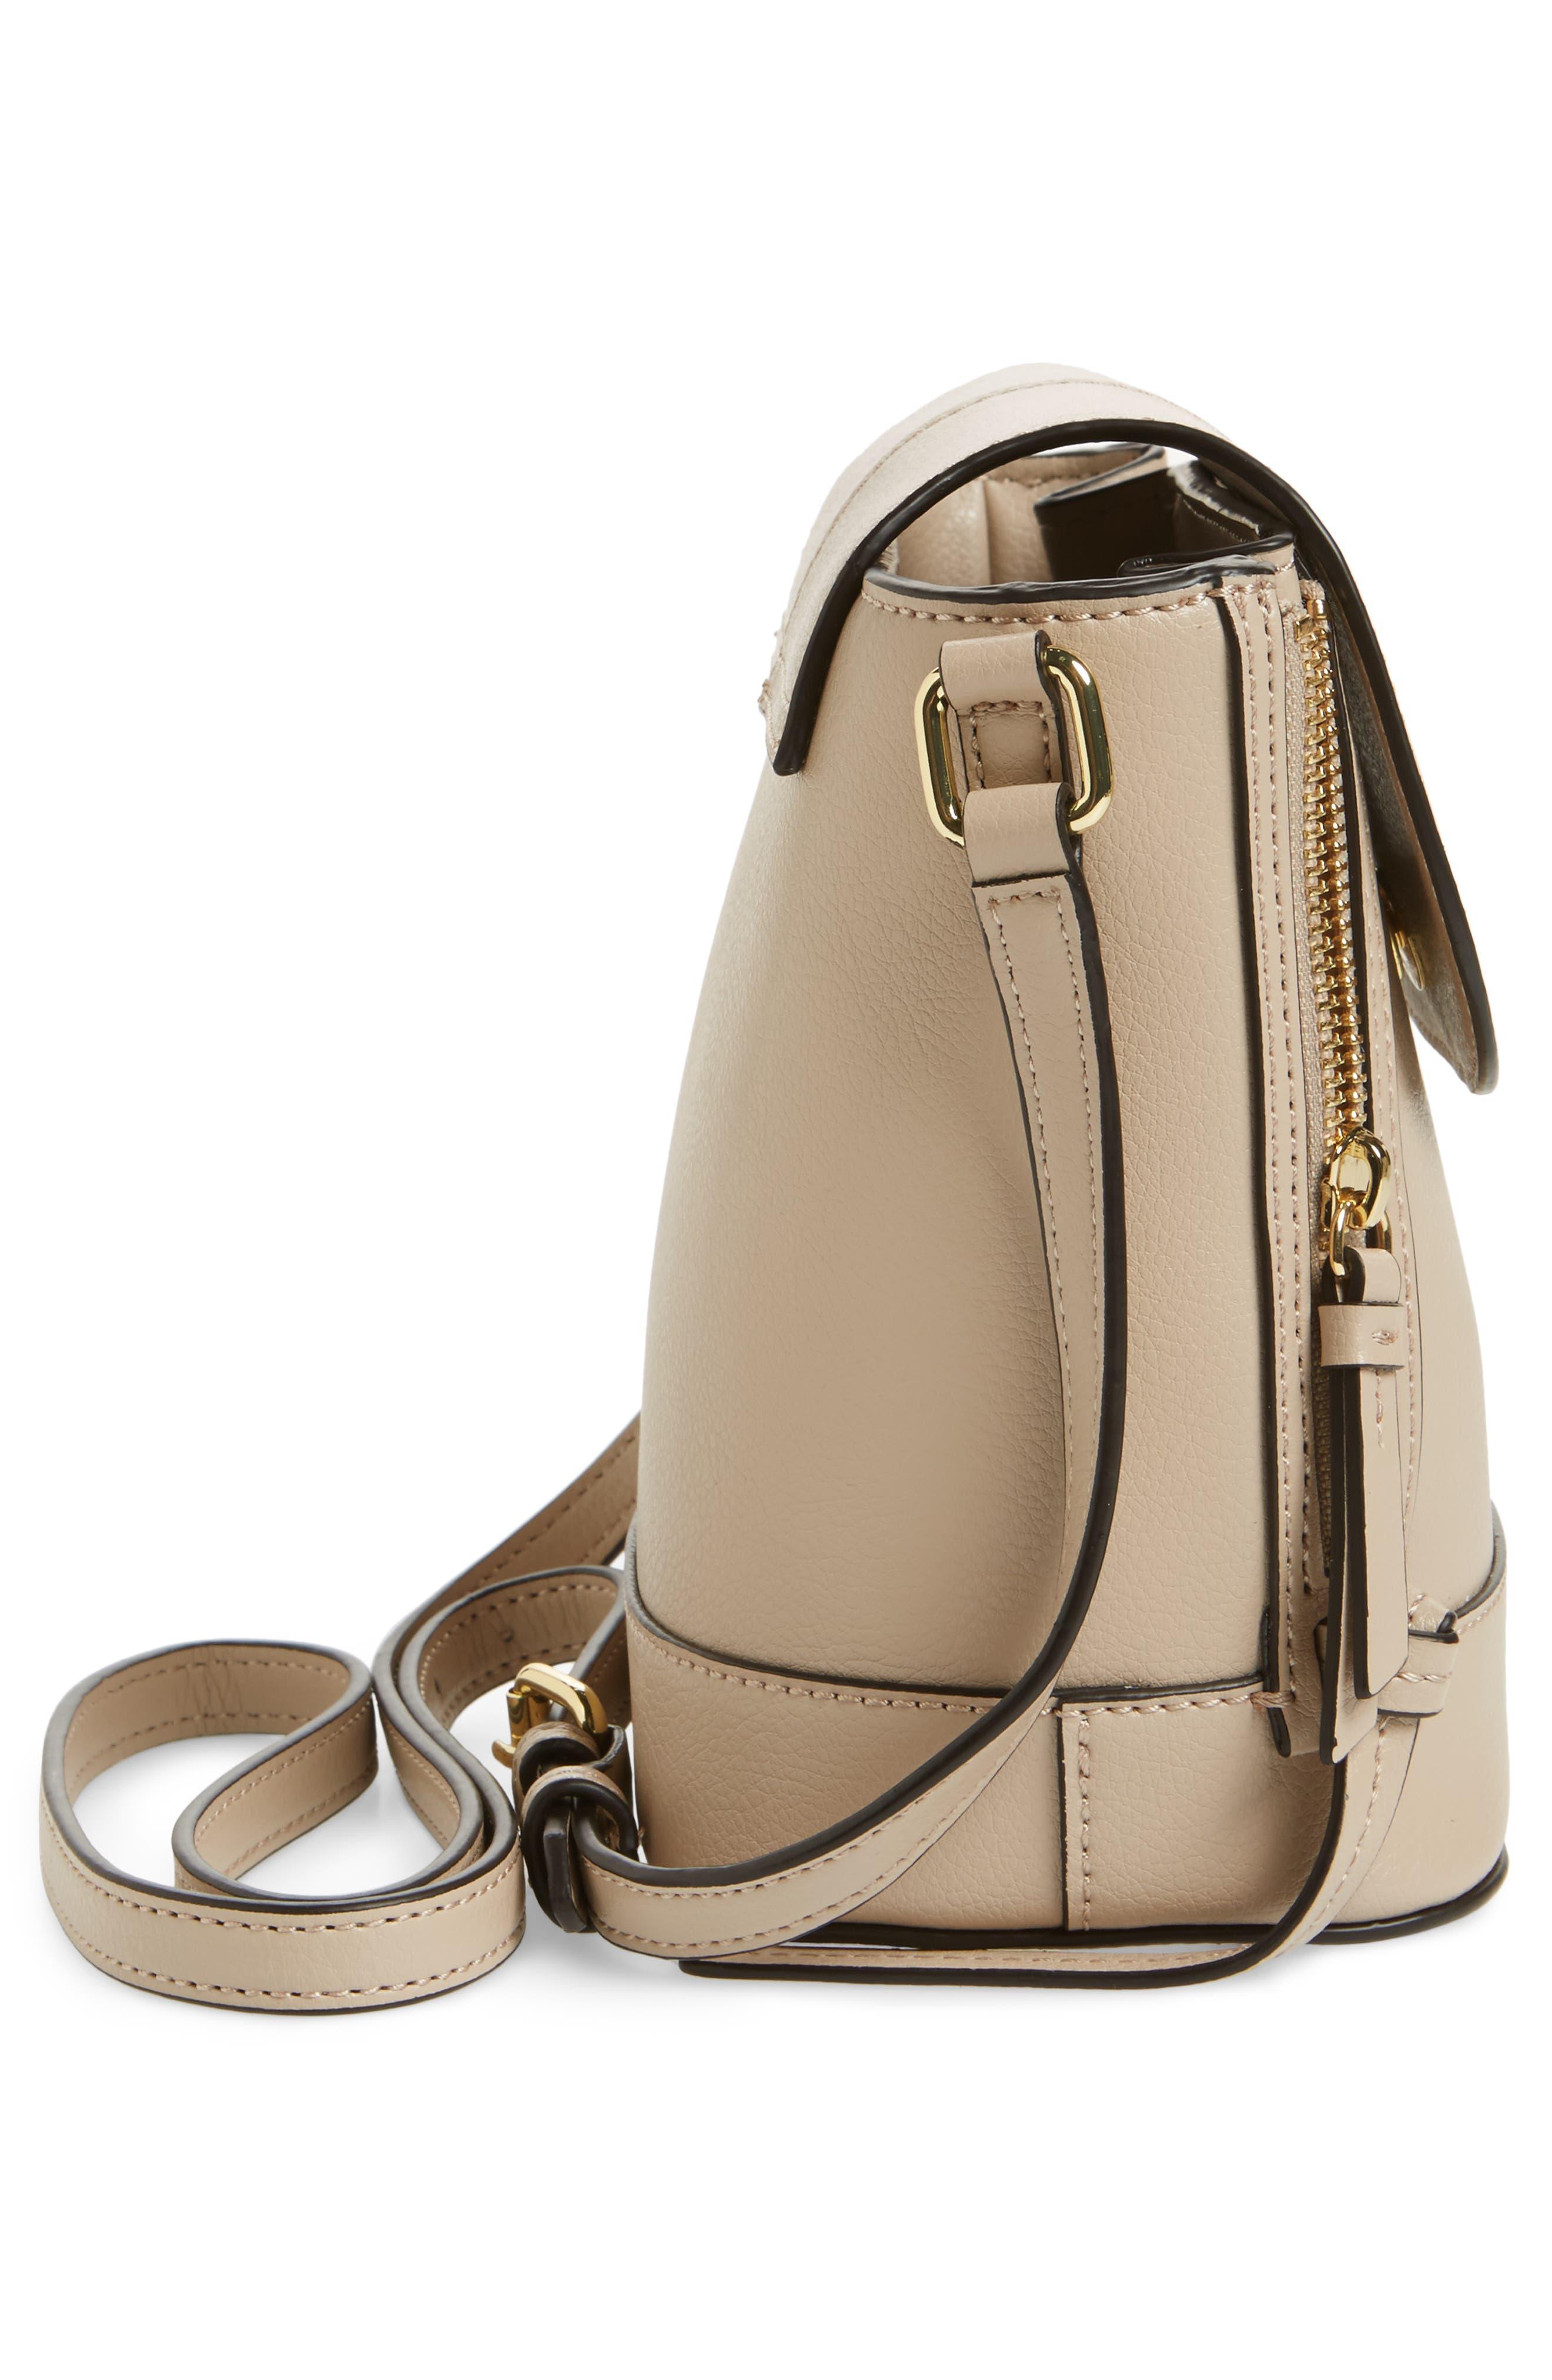 Beckett Leather Crossbody Bag,                             Alternate thumbnail 5, color,                             250